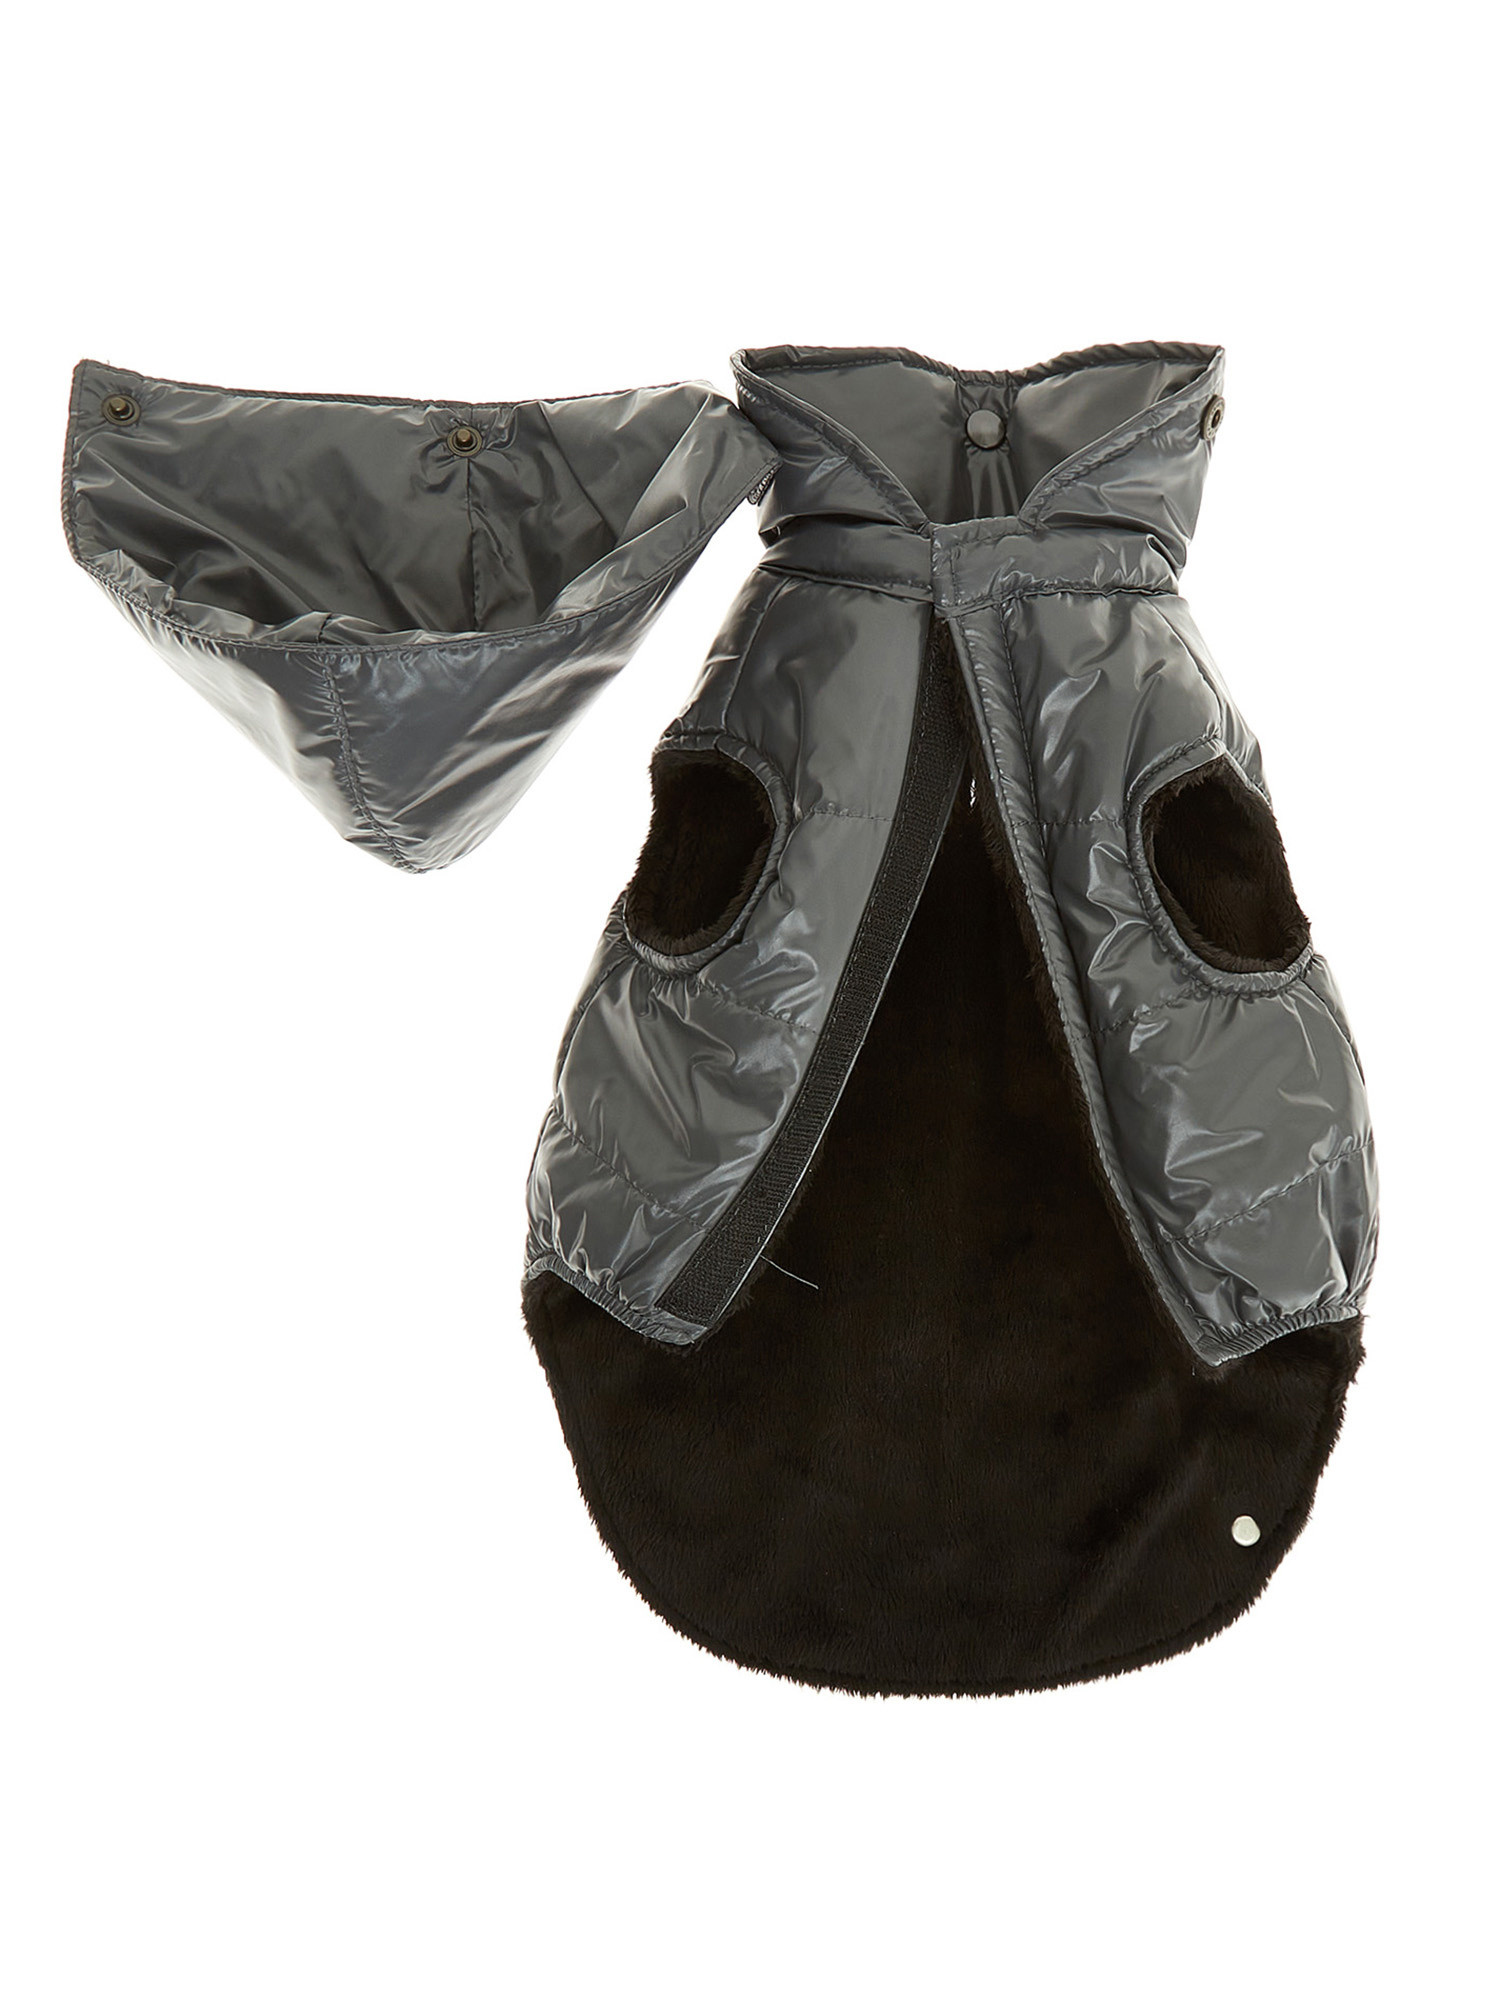 Cappottino tessuto impermeabile antivento Vermont, Grigio scuro, large image number 2